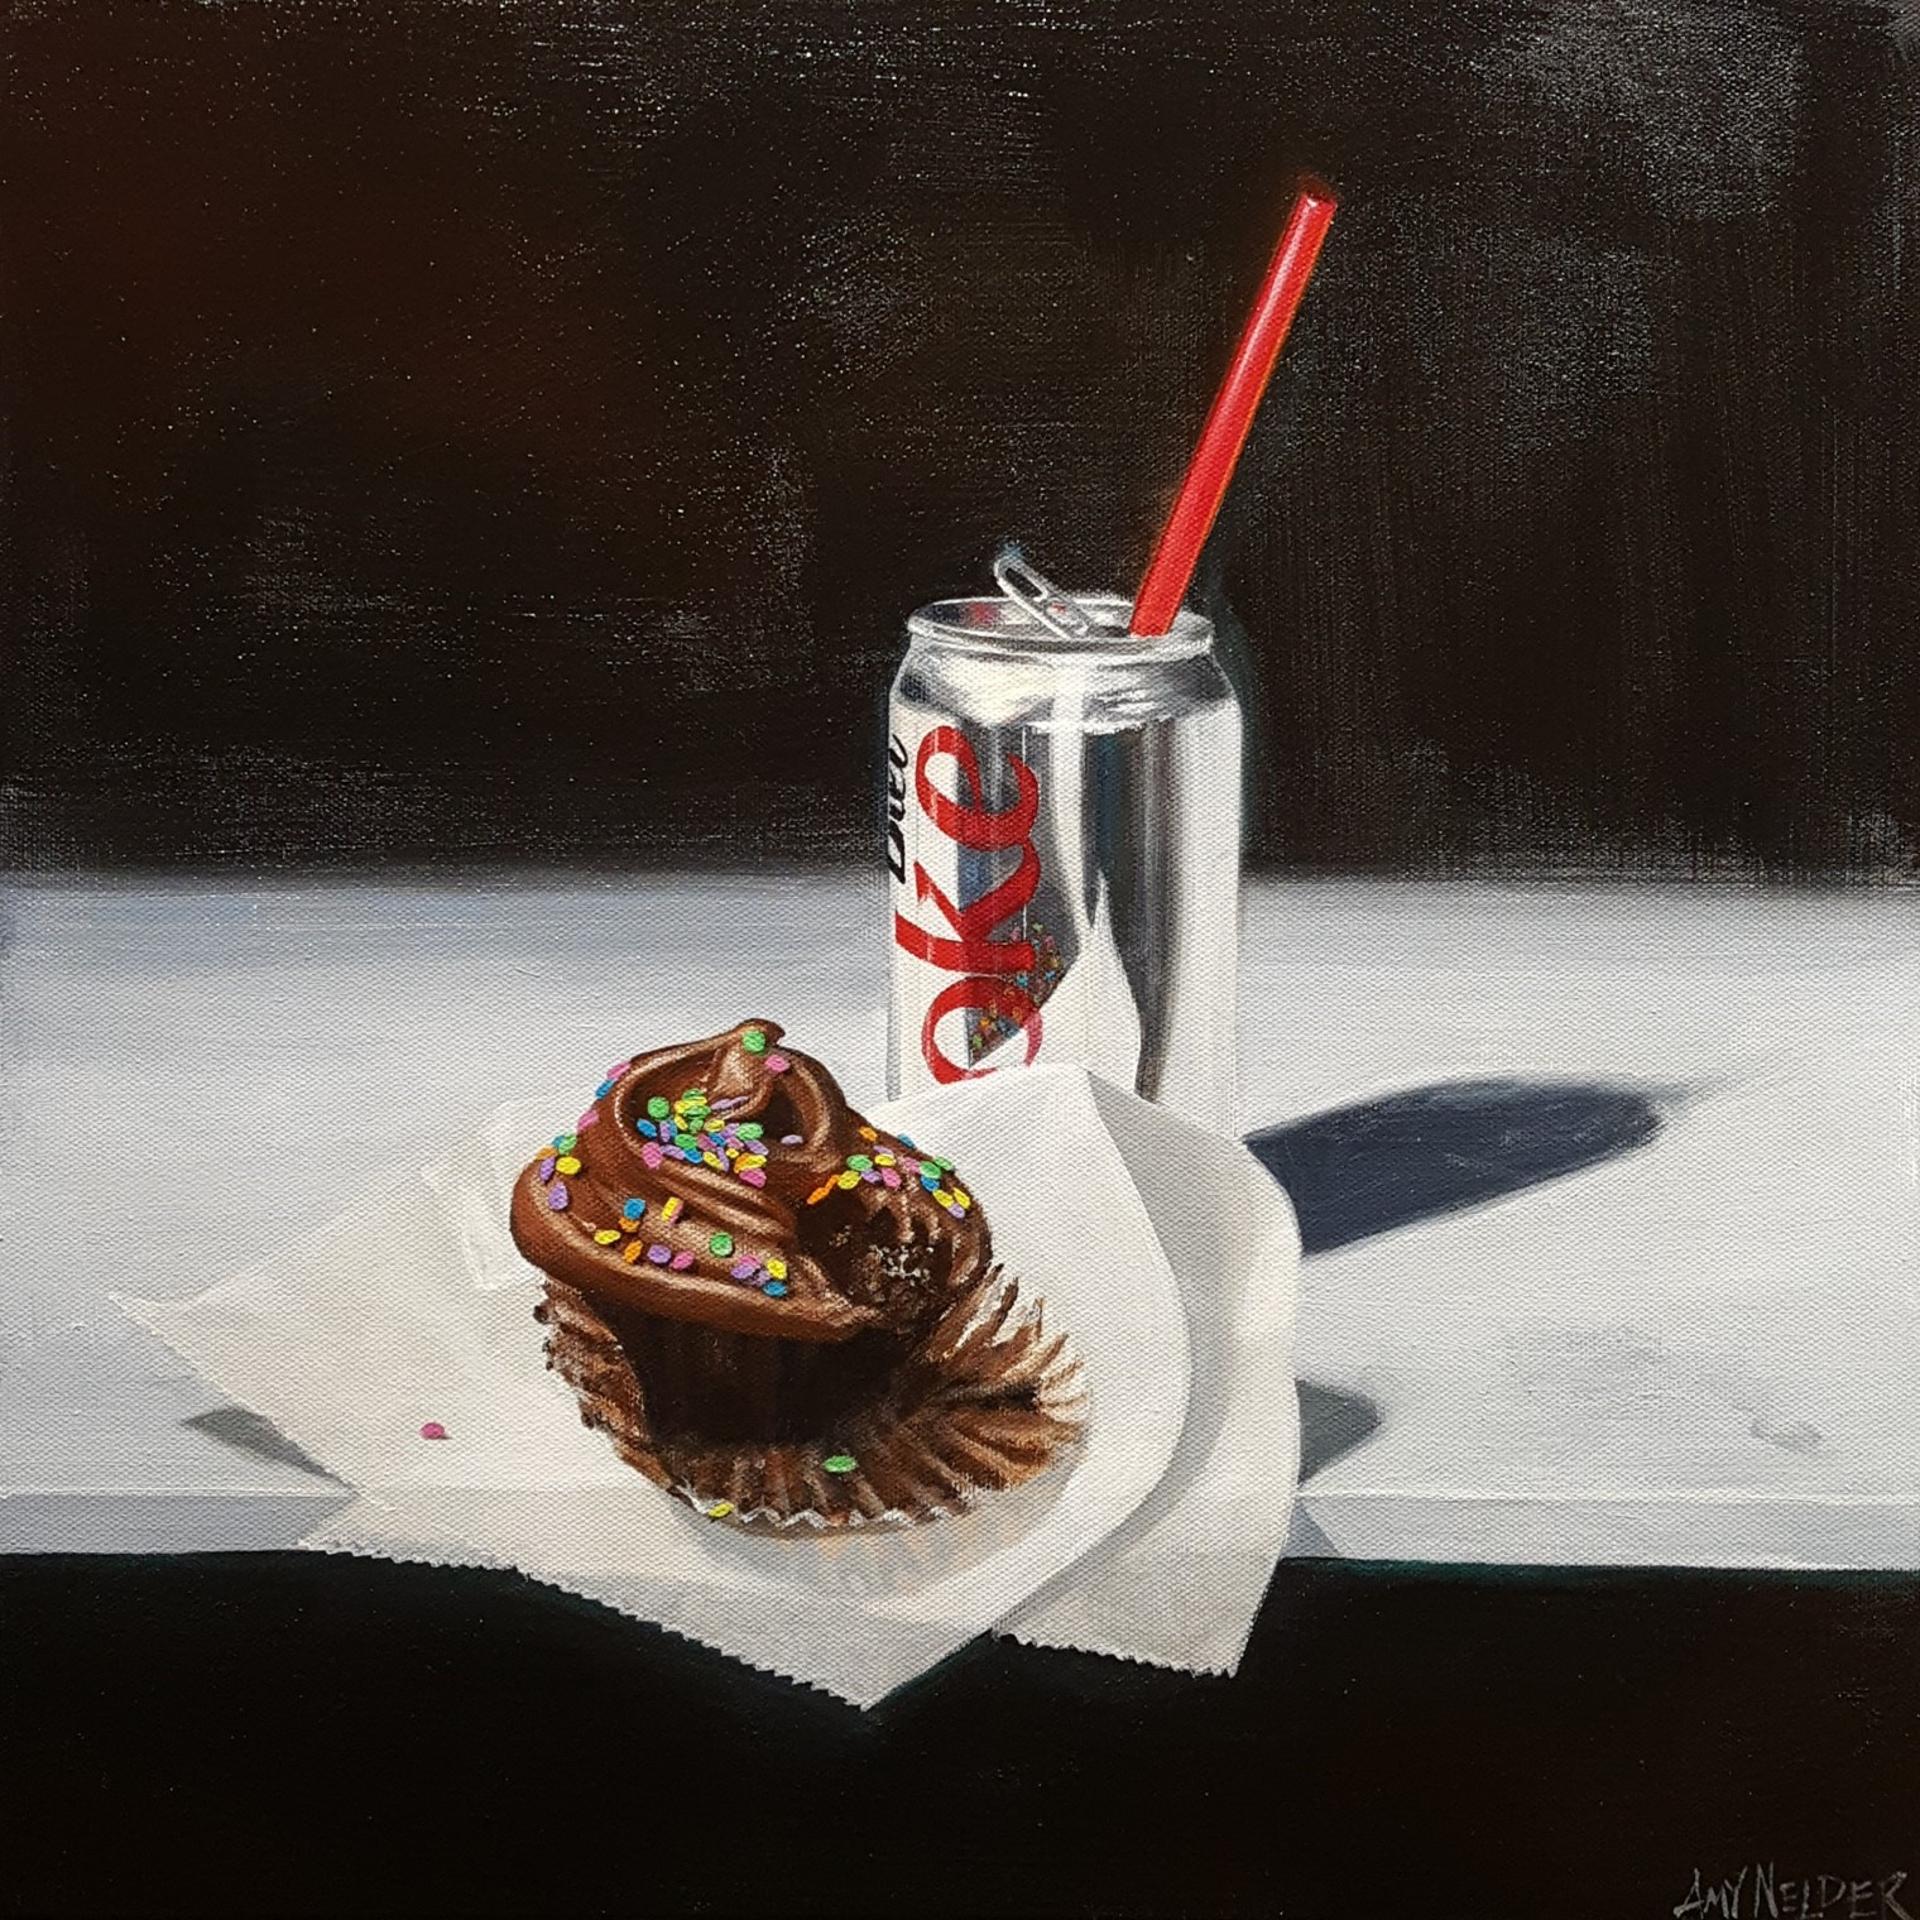 Kidding Myself with Sprinkles by Amy Nelder